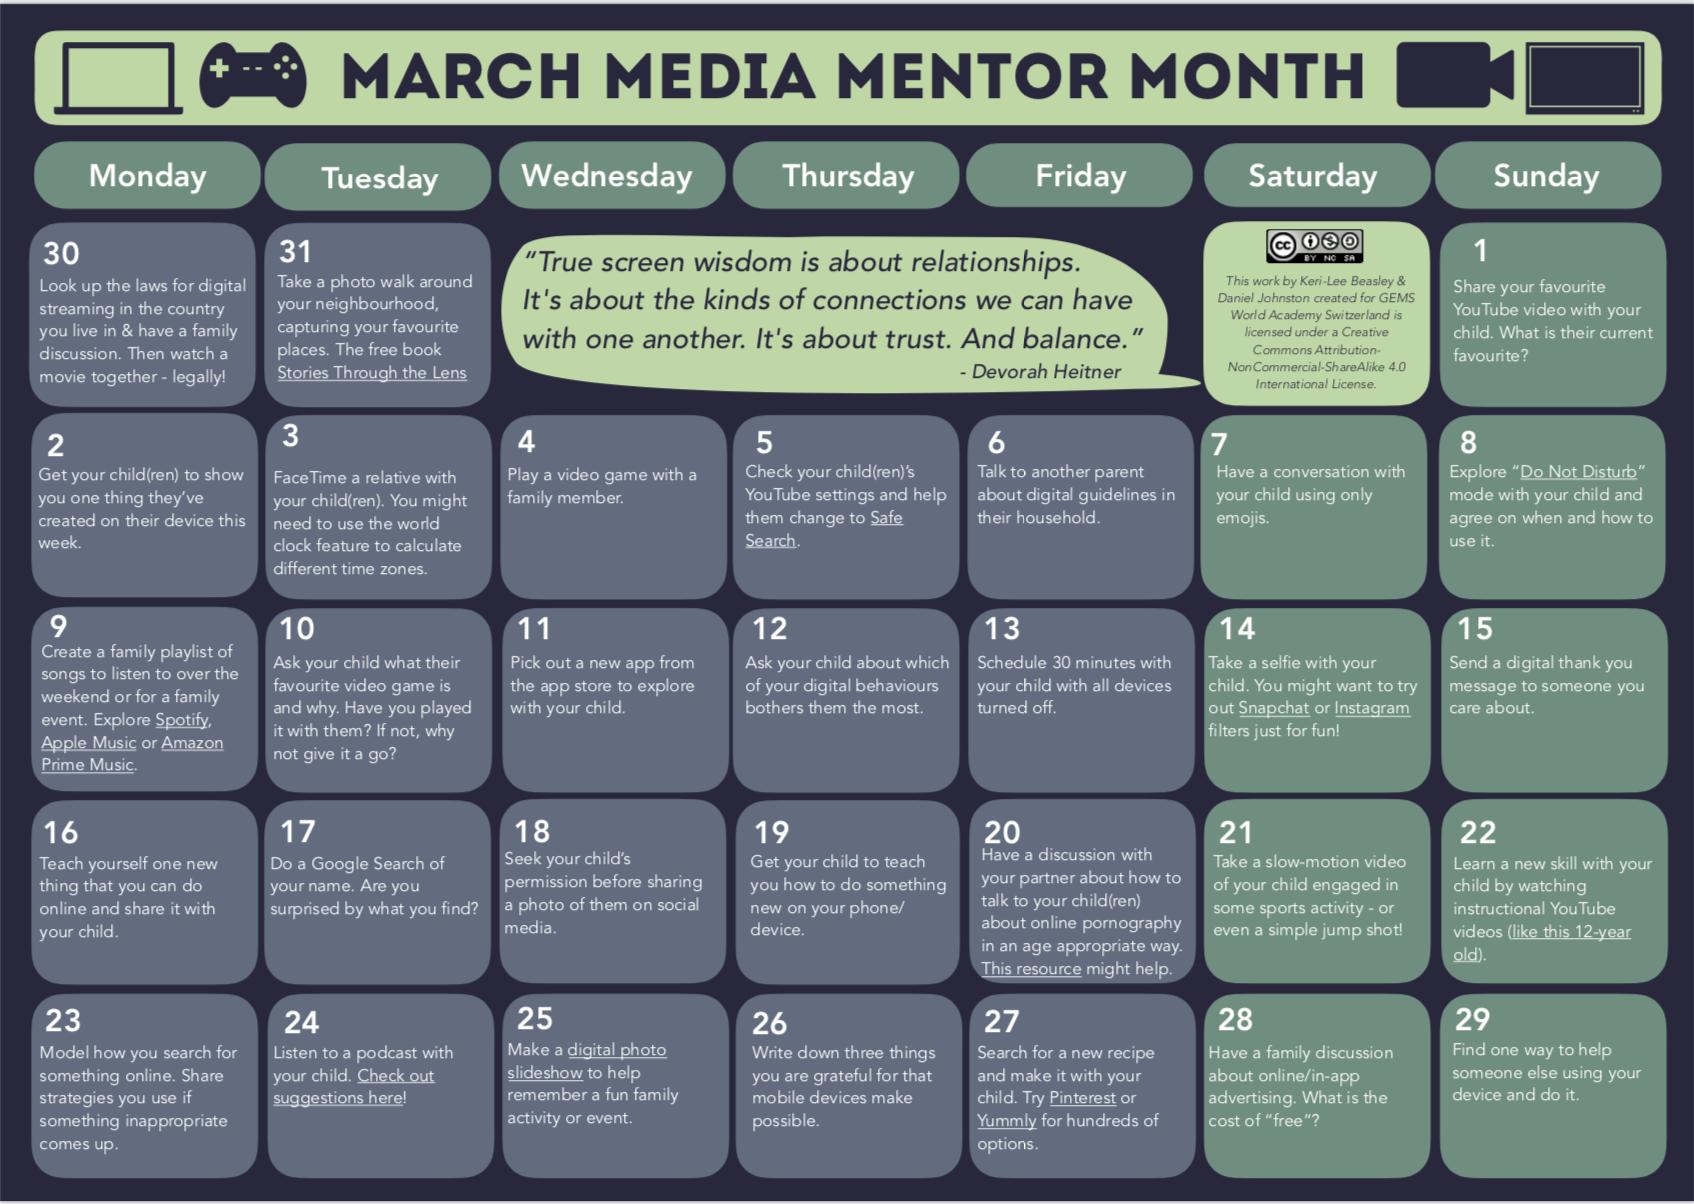 Media Mentor Month 2020